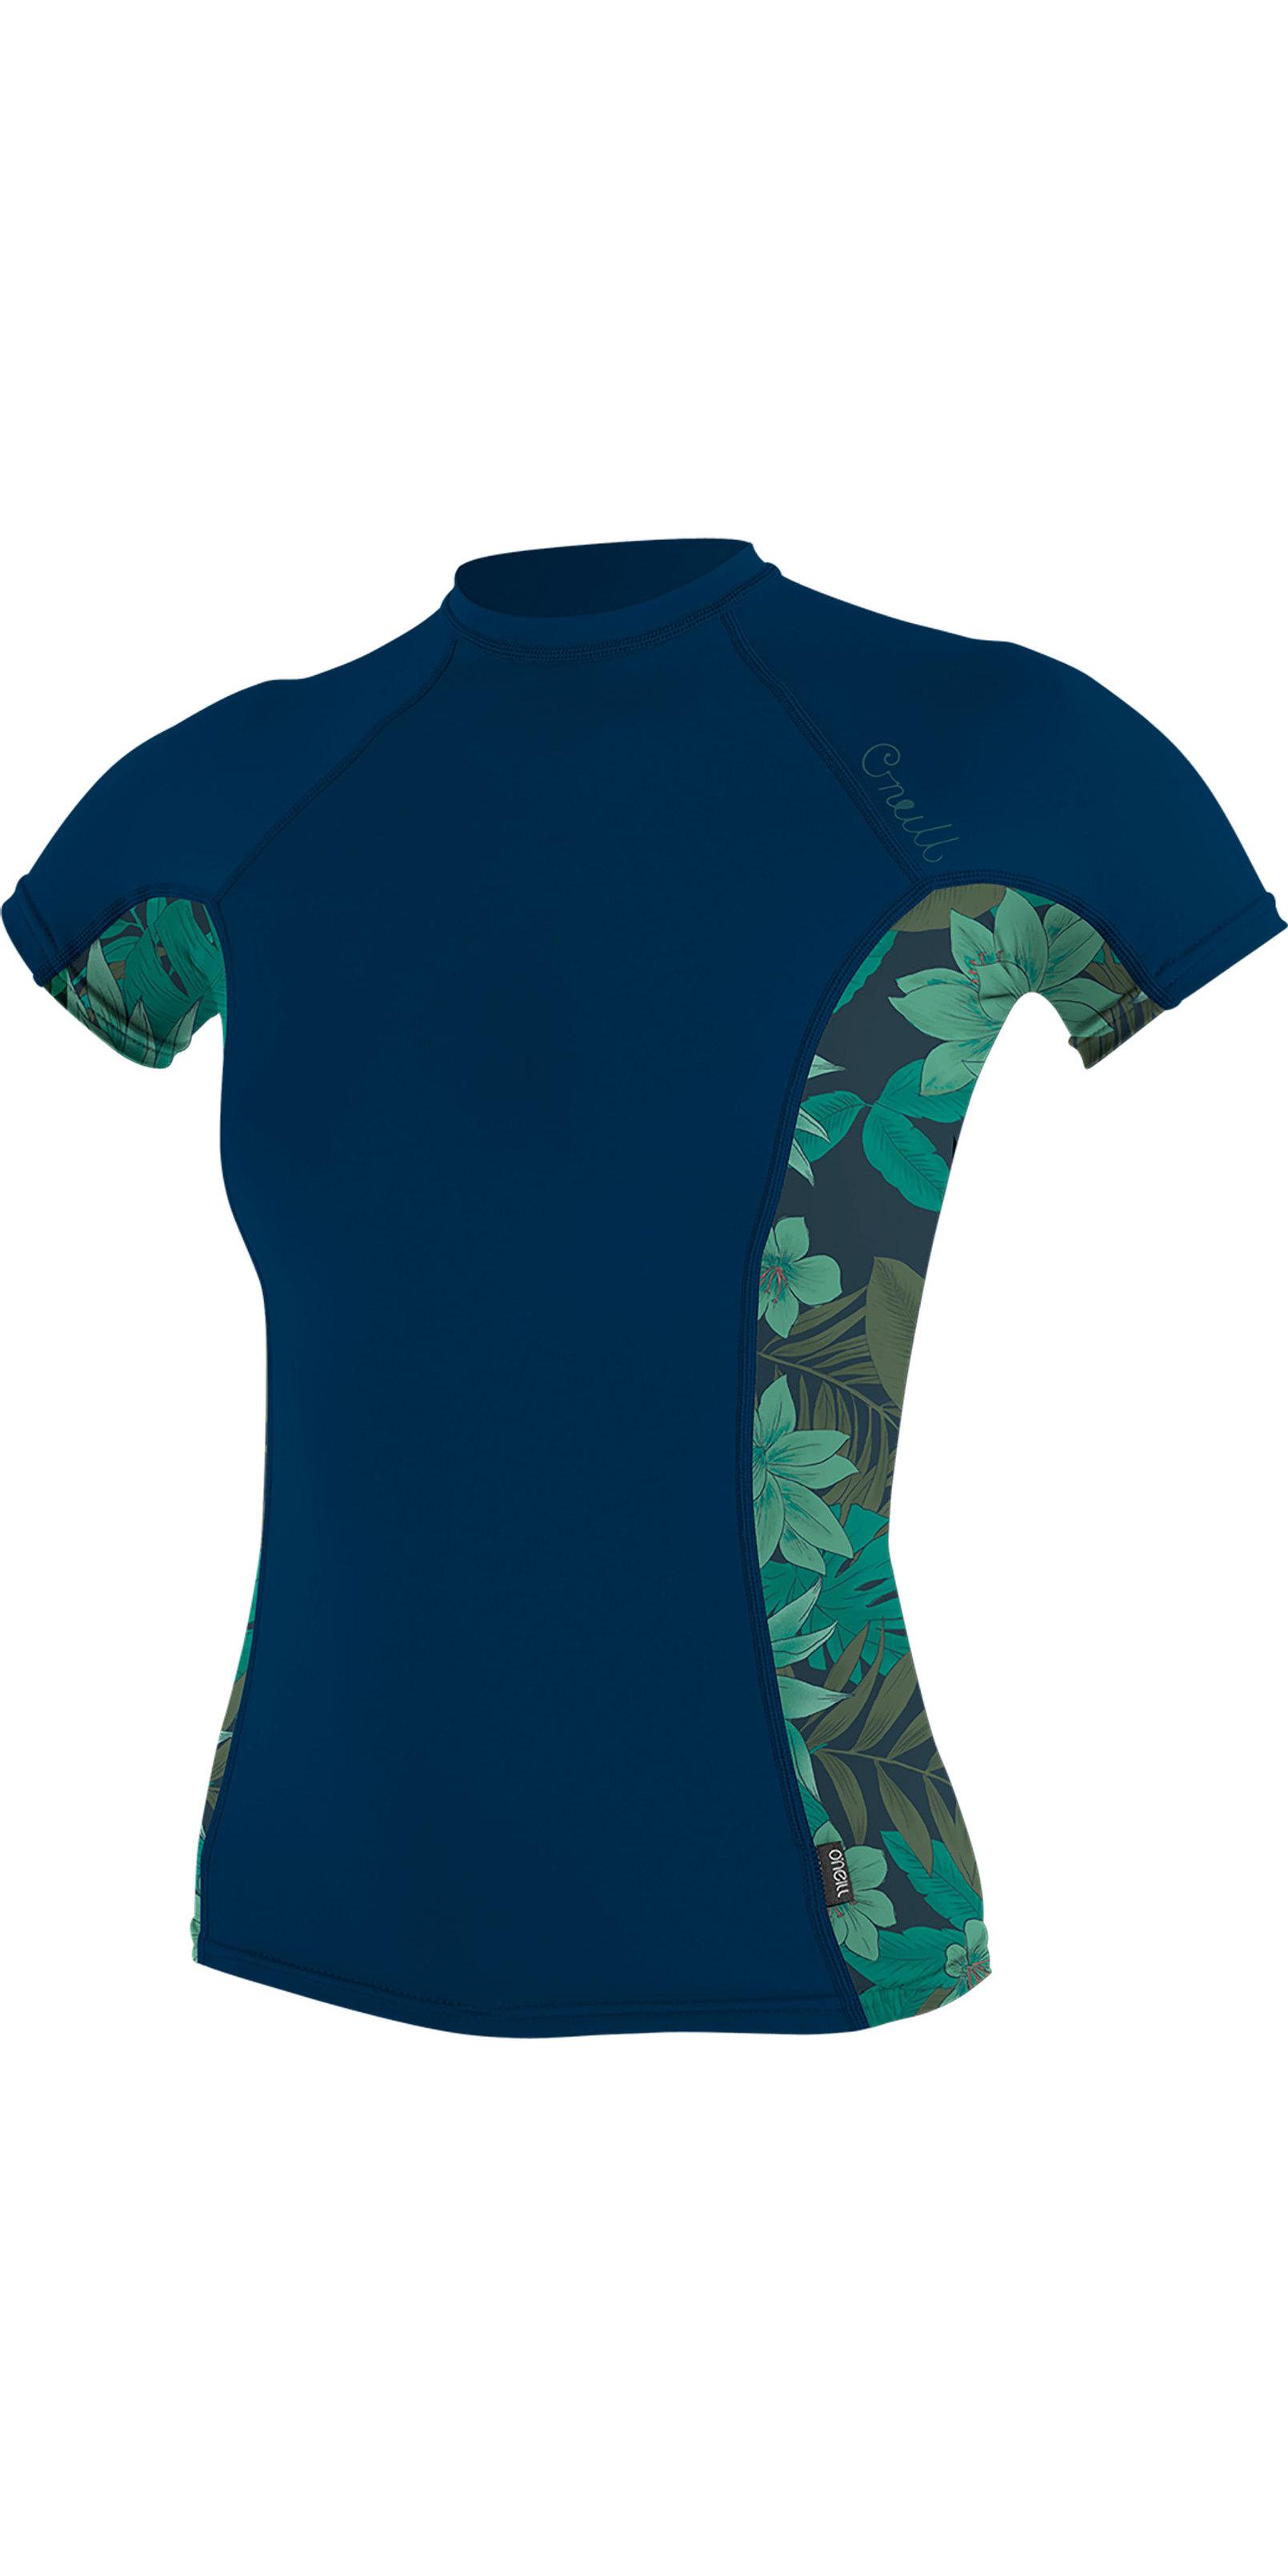 2019 O'Neill Womens Side Print Short Sleeve Rash Vest Abyss / Faro 5309S